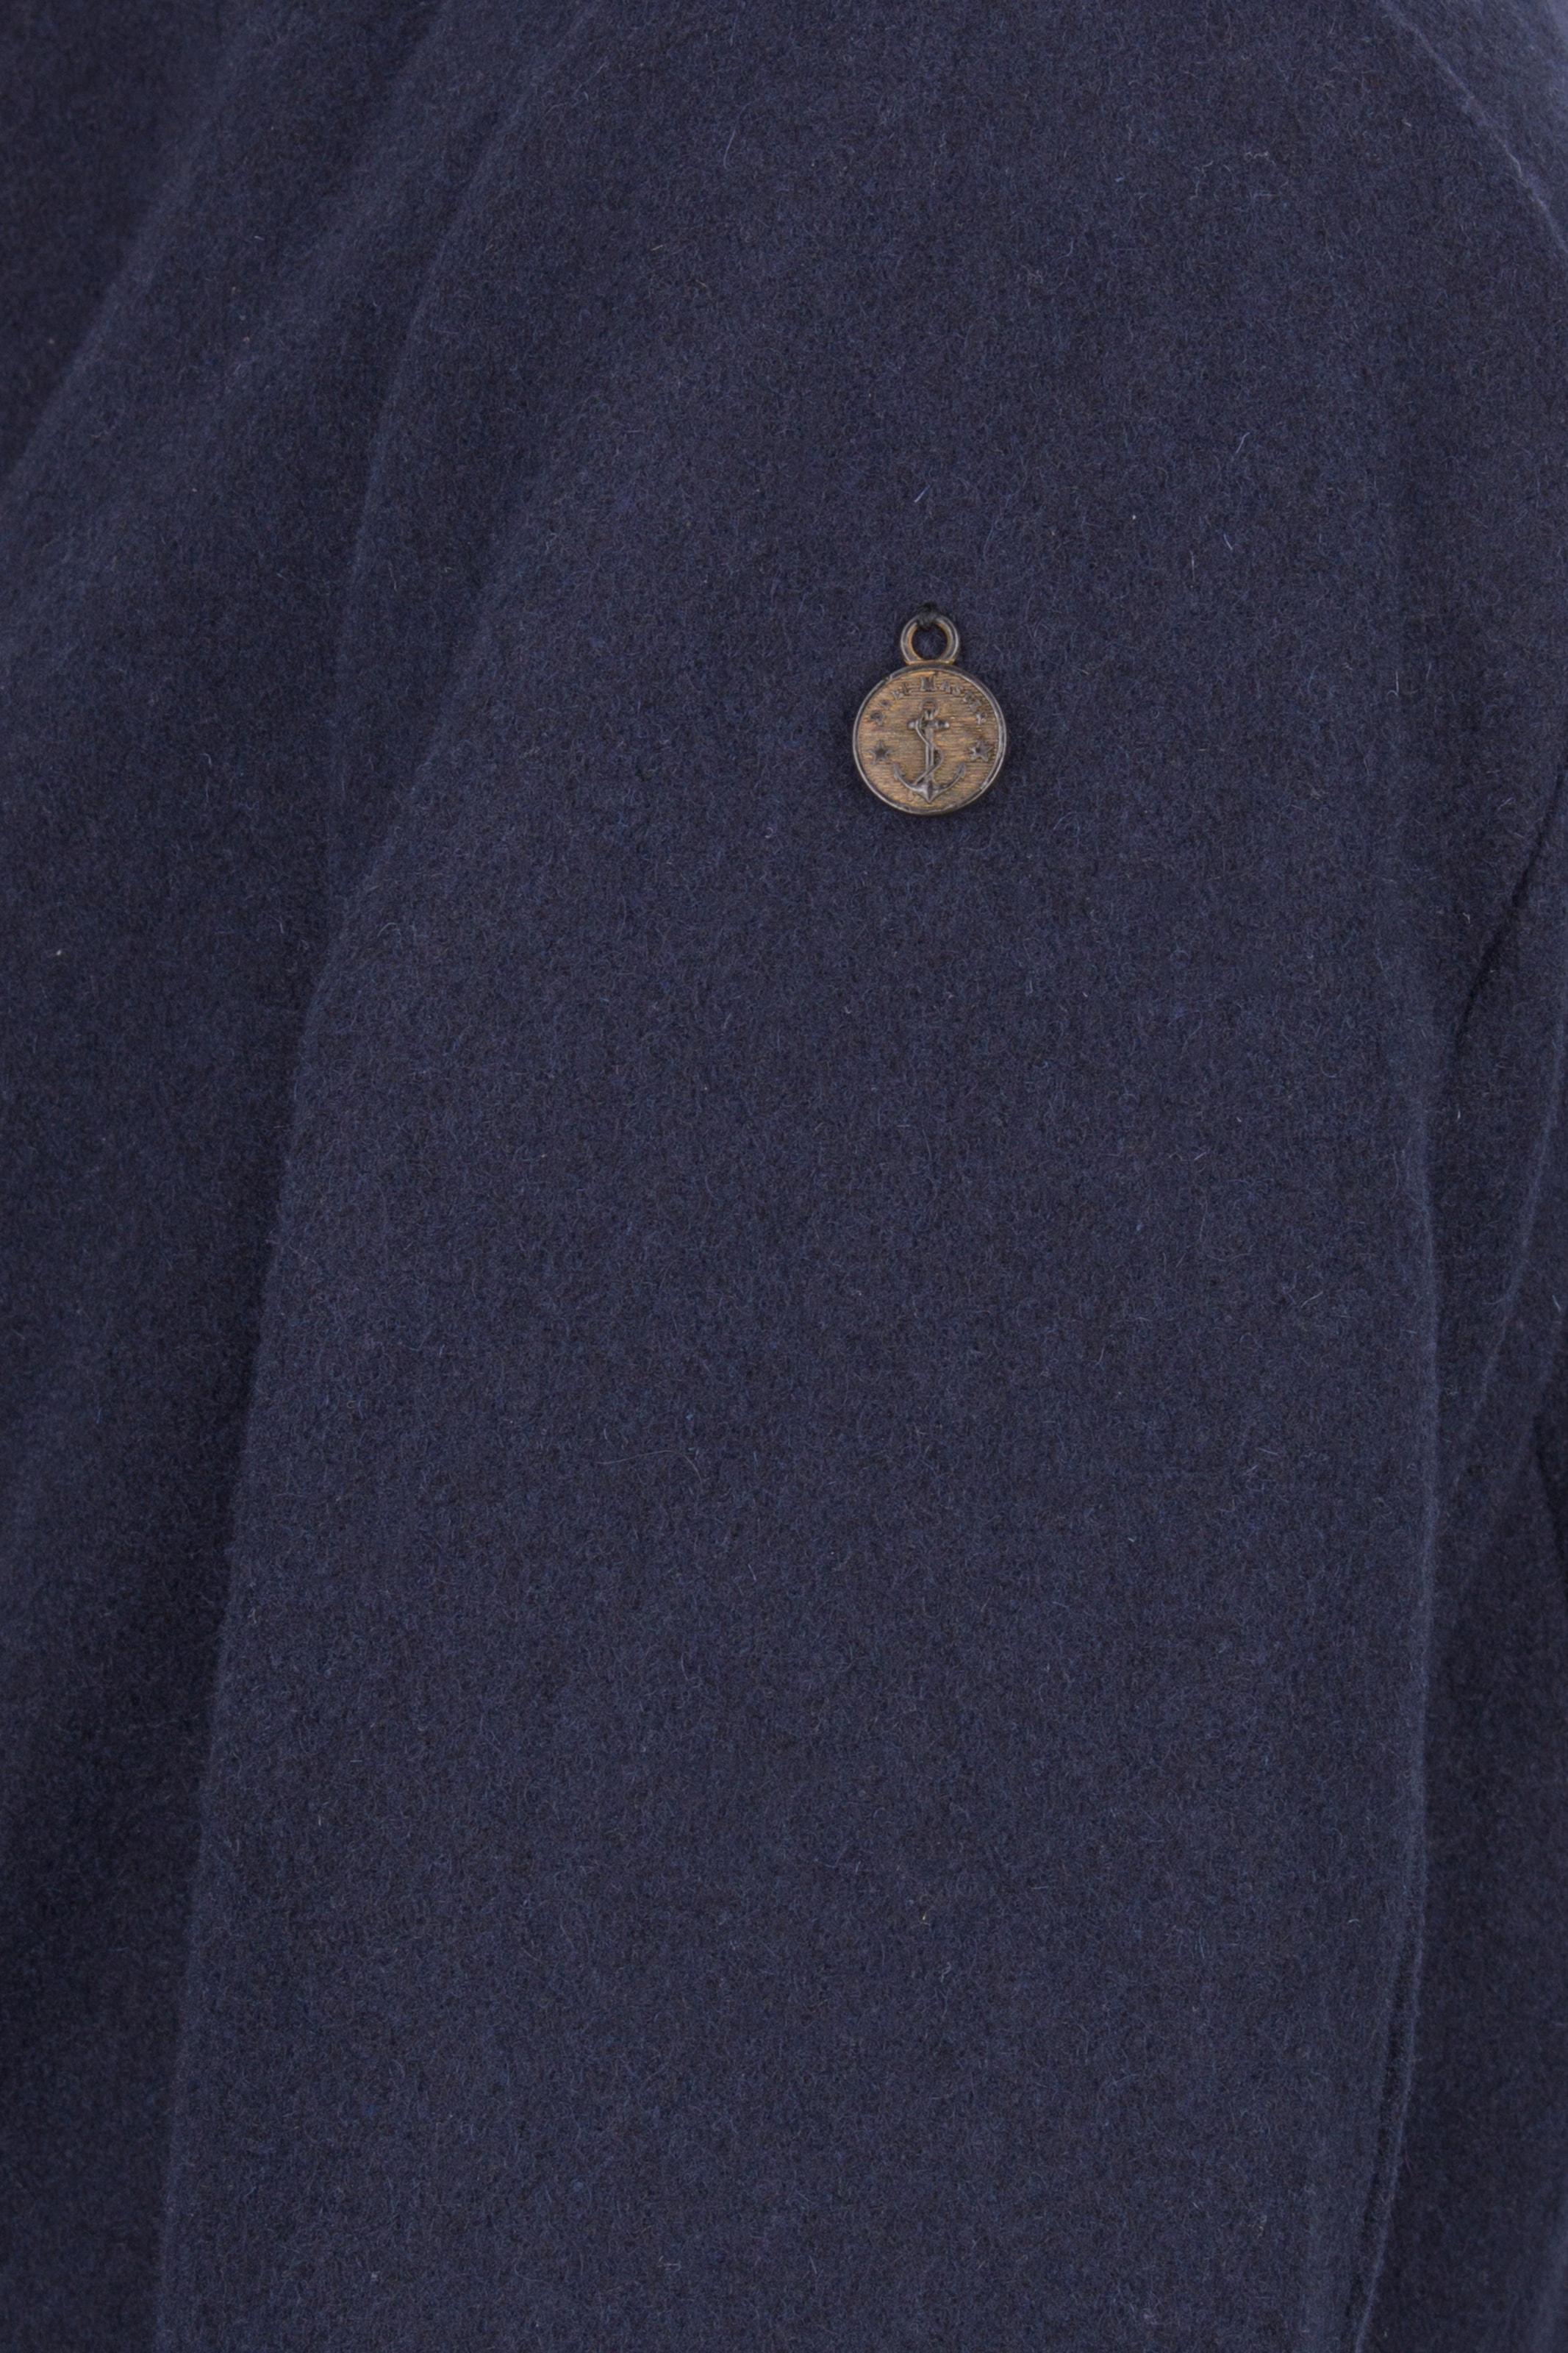 Dreimaster saison Mi Marine Manteau En qSzMpVGU